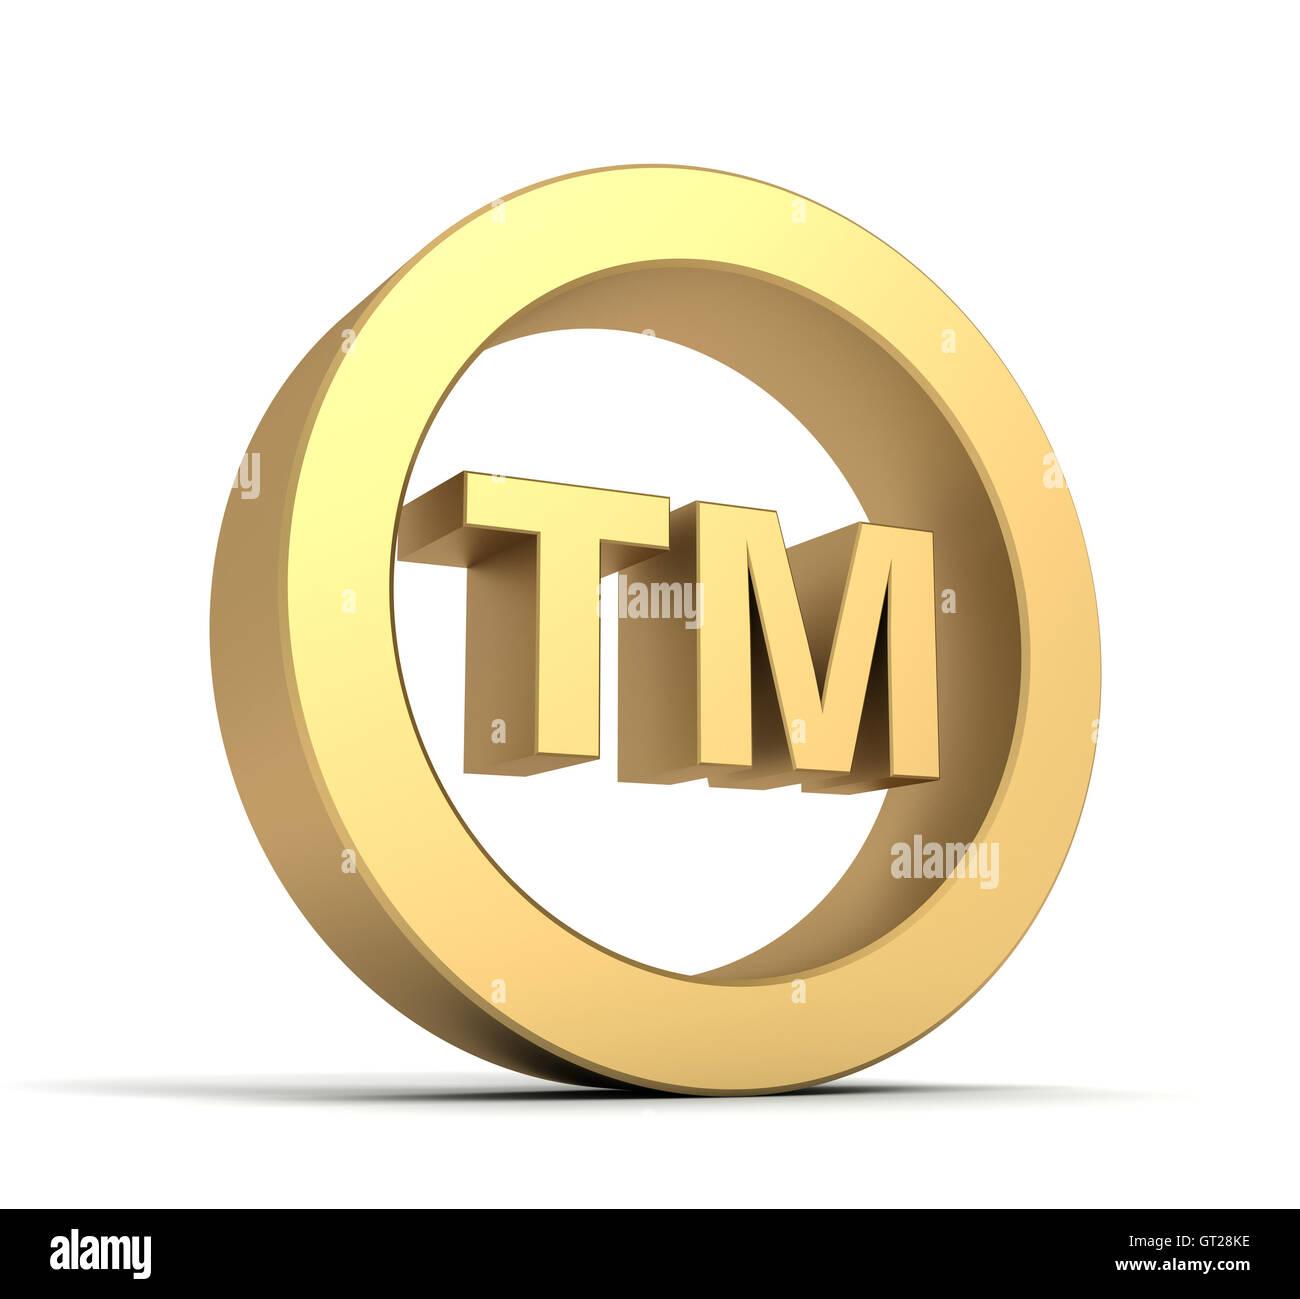 Tm trade mark sign concept 3d illustration stock photo royalty tm trade mark sign concept 3d illustration buycottarizona